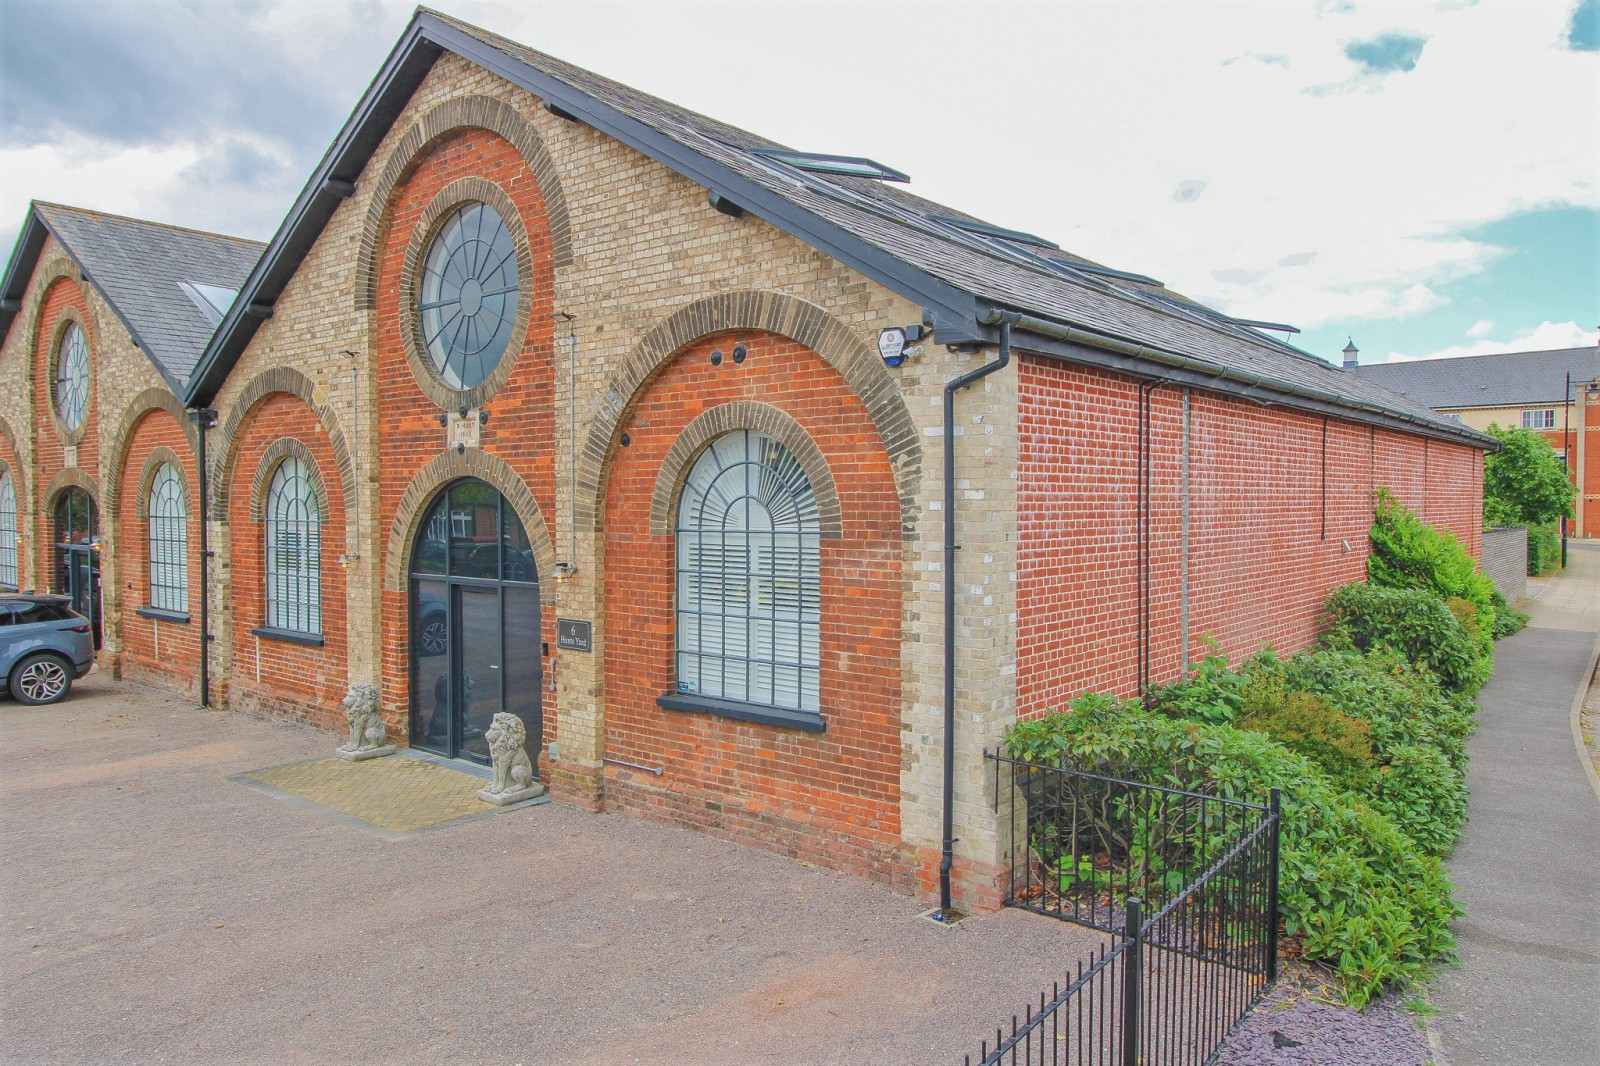 Hunts Yard, Massingham Drive, Earls Colne, Colchester, Essex, CO6